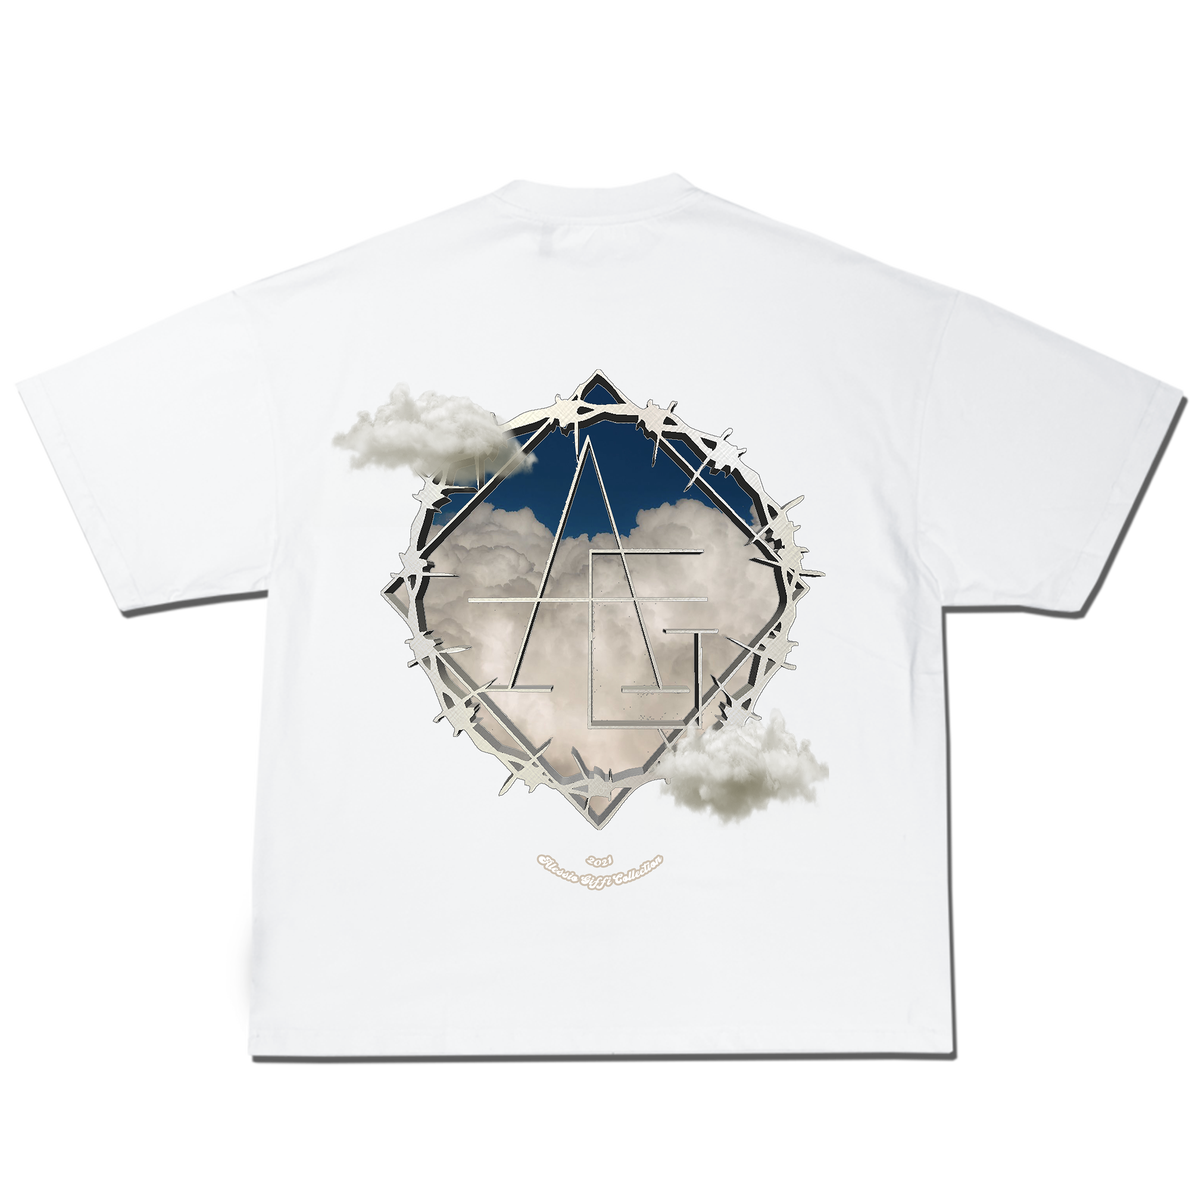 Image of Clouds logo tee - BOXYFIT